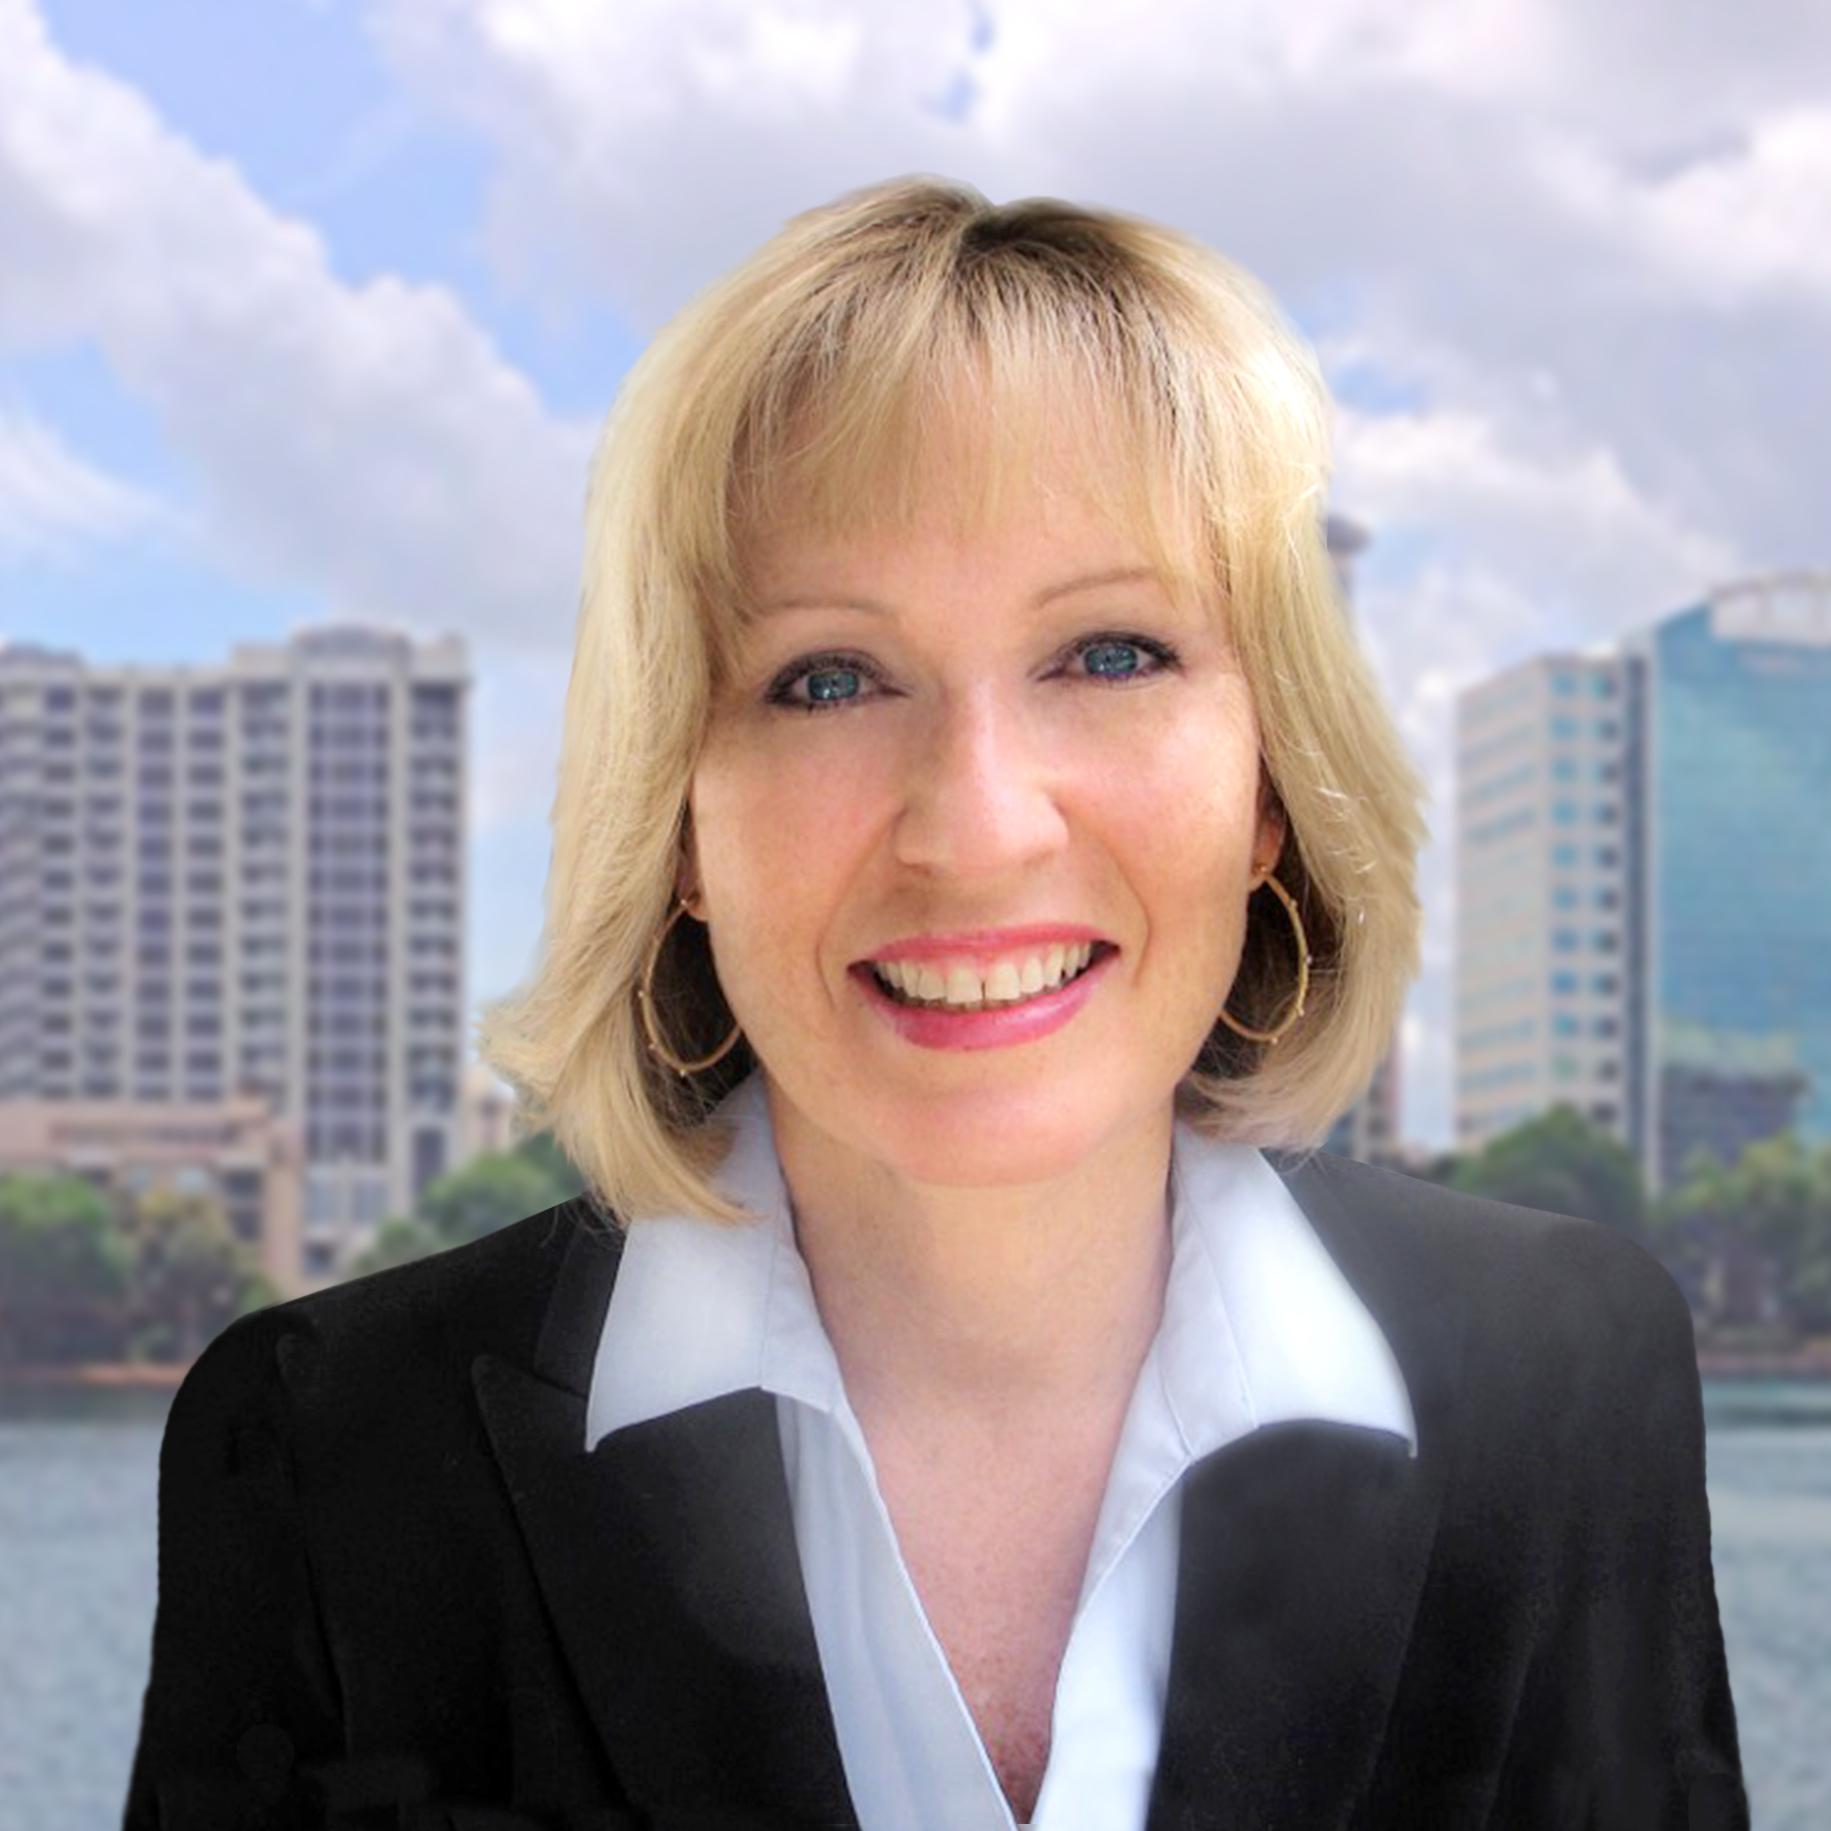 Monika Chappell